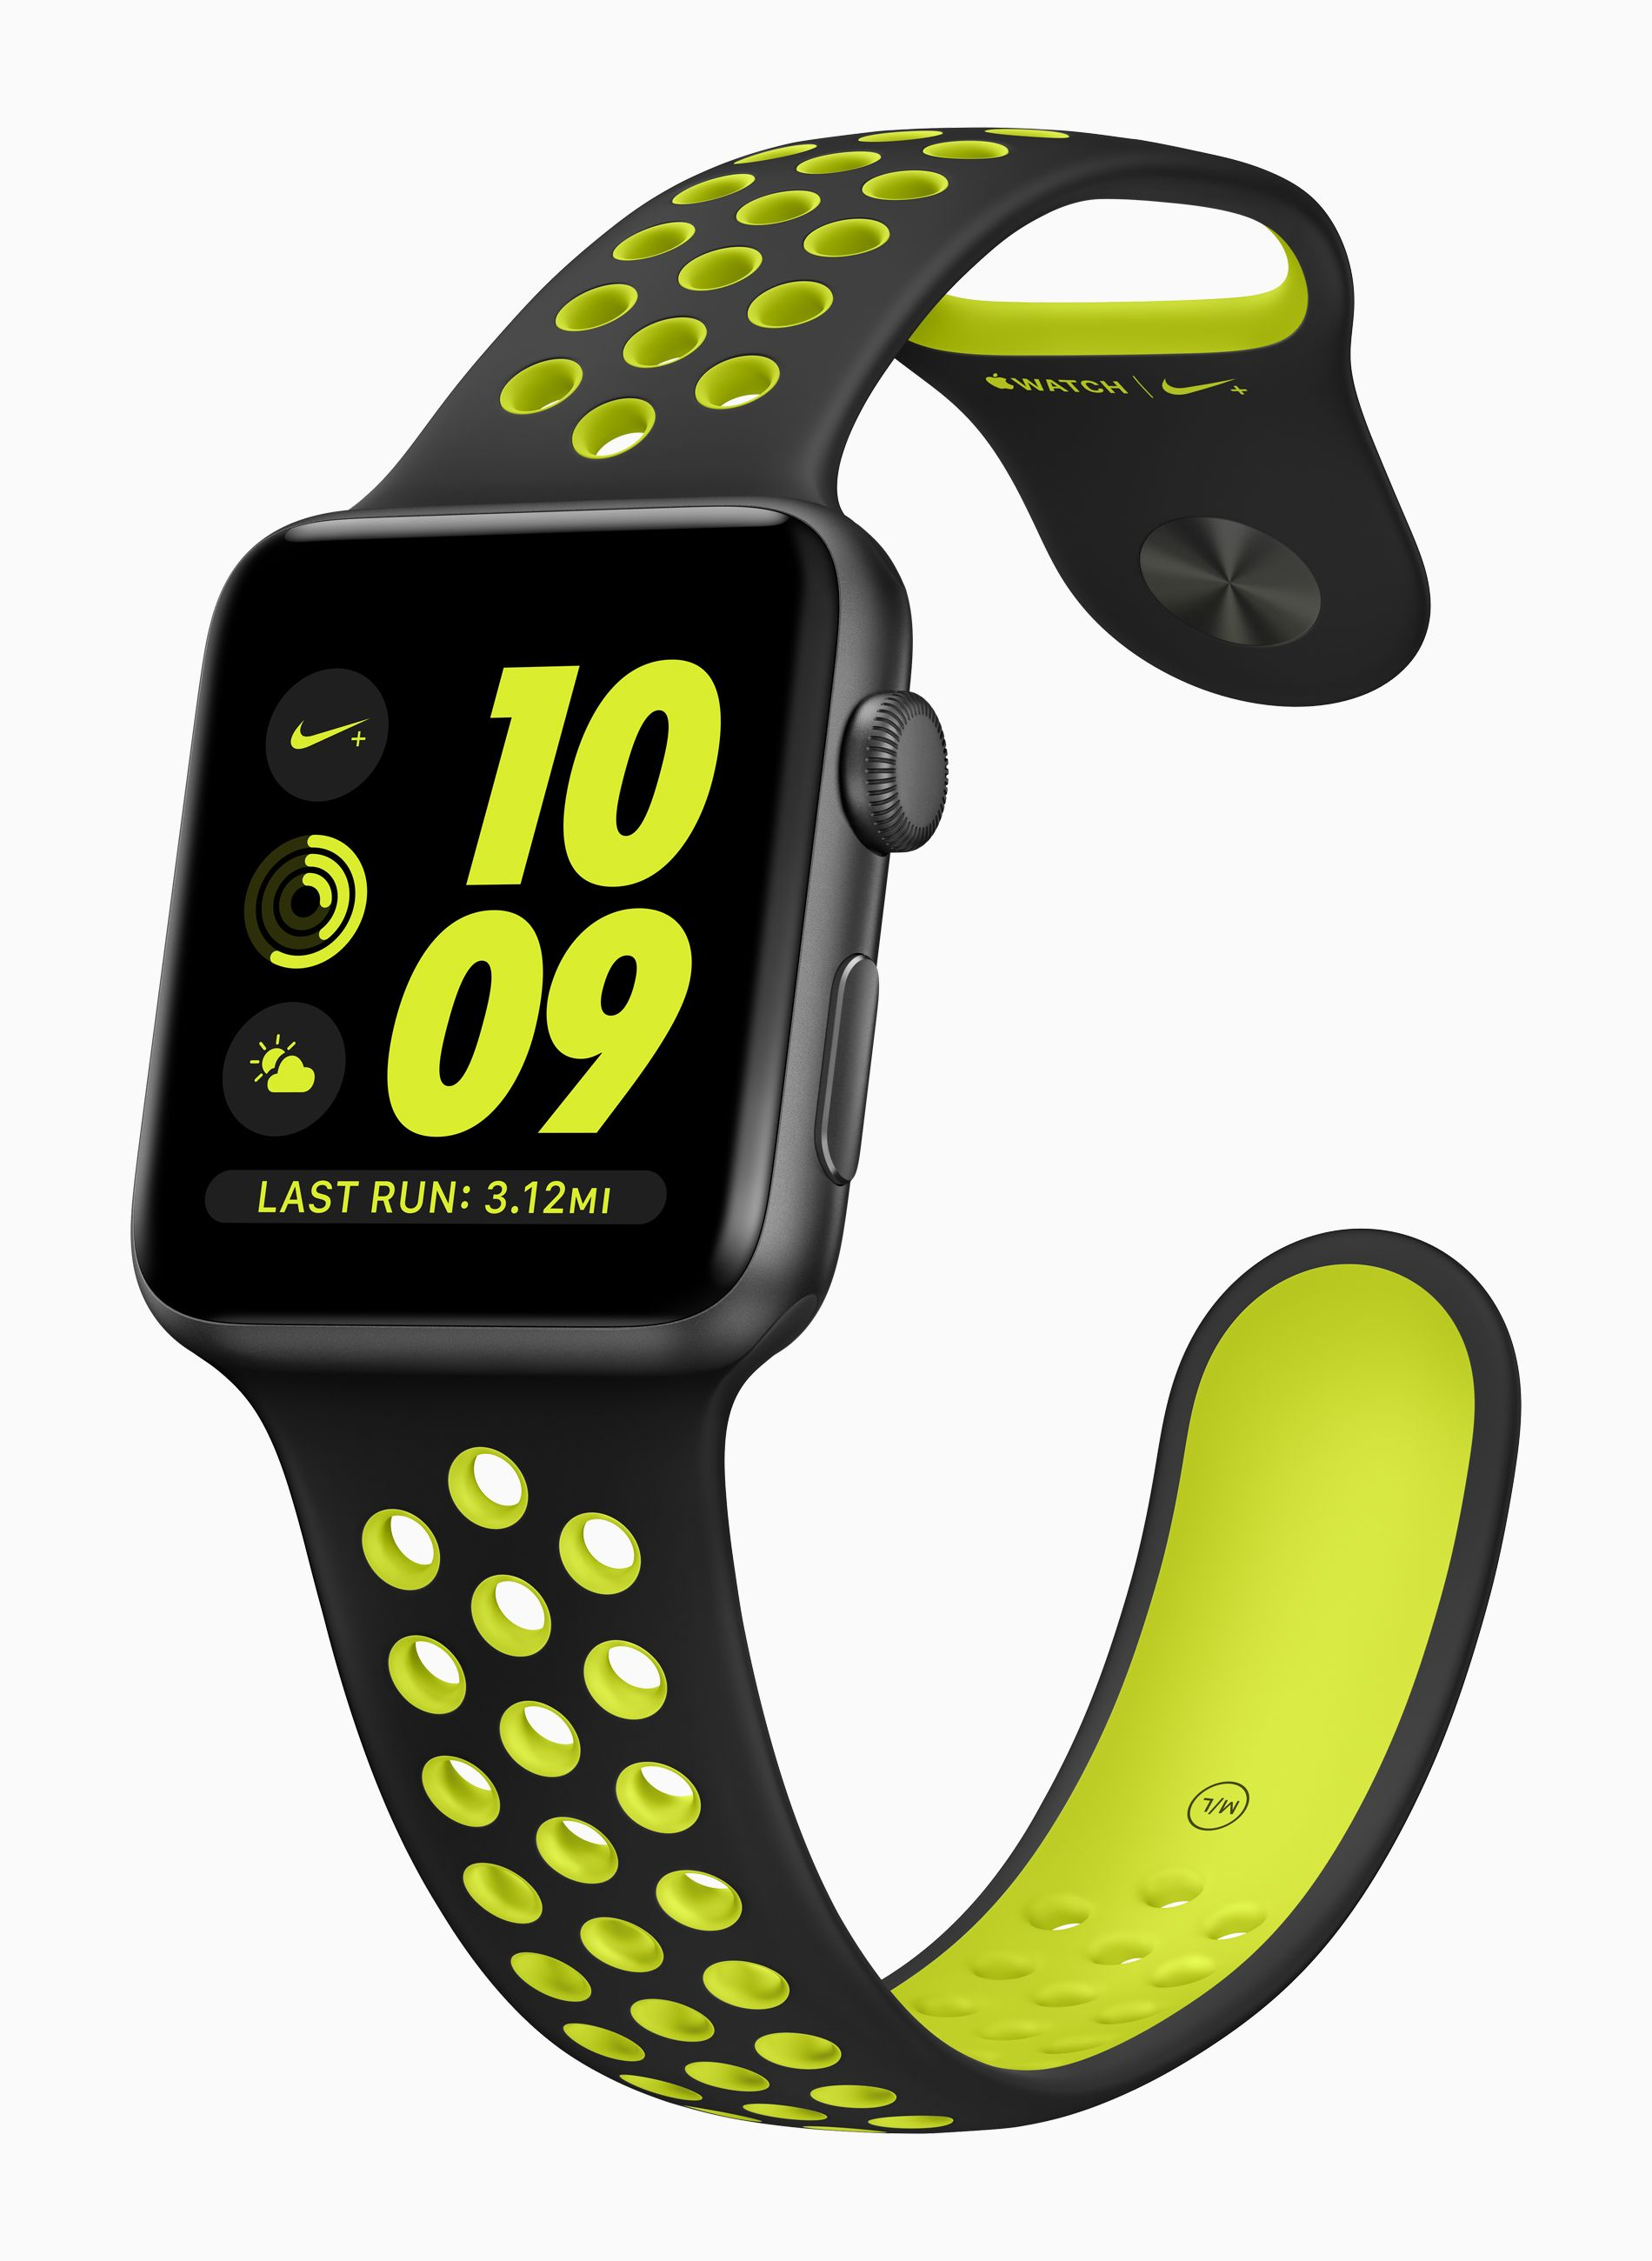 Buy Apple Watch Nike+   Brand Collab in 2019   Apple watch